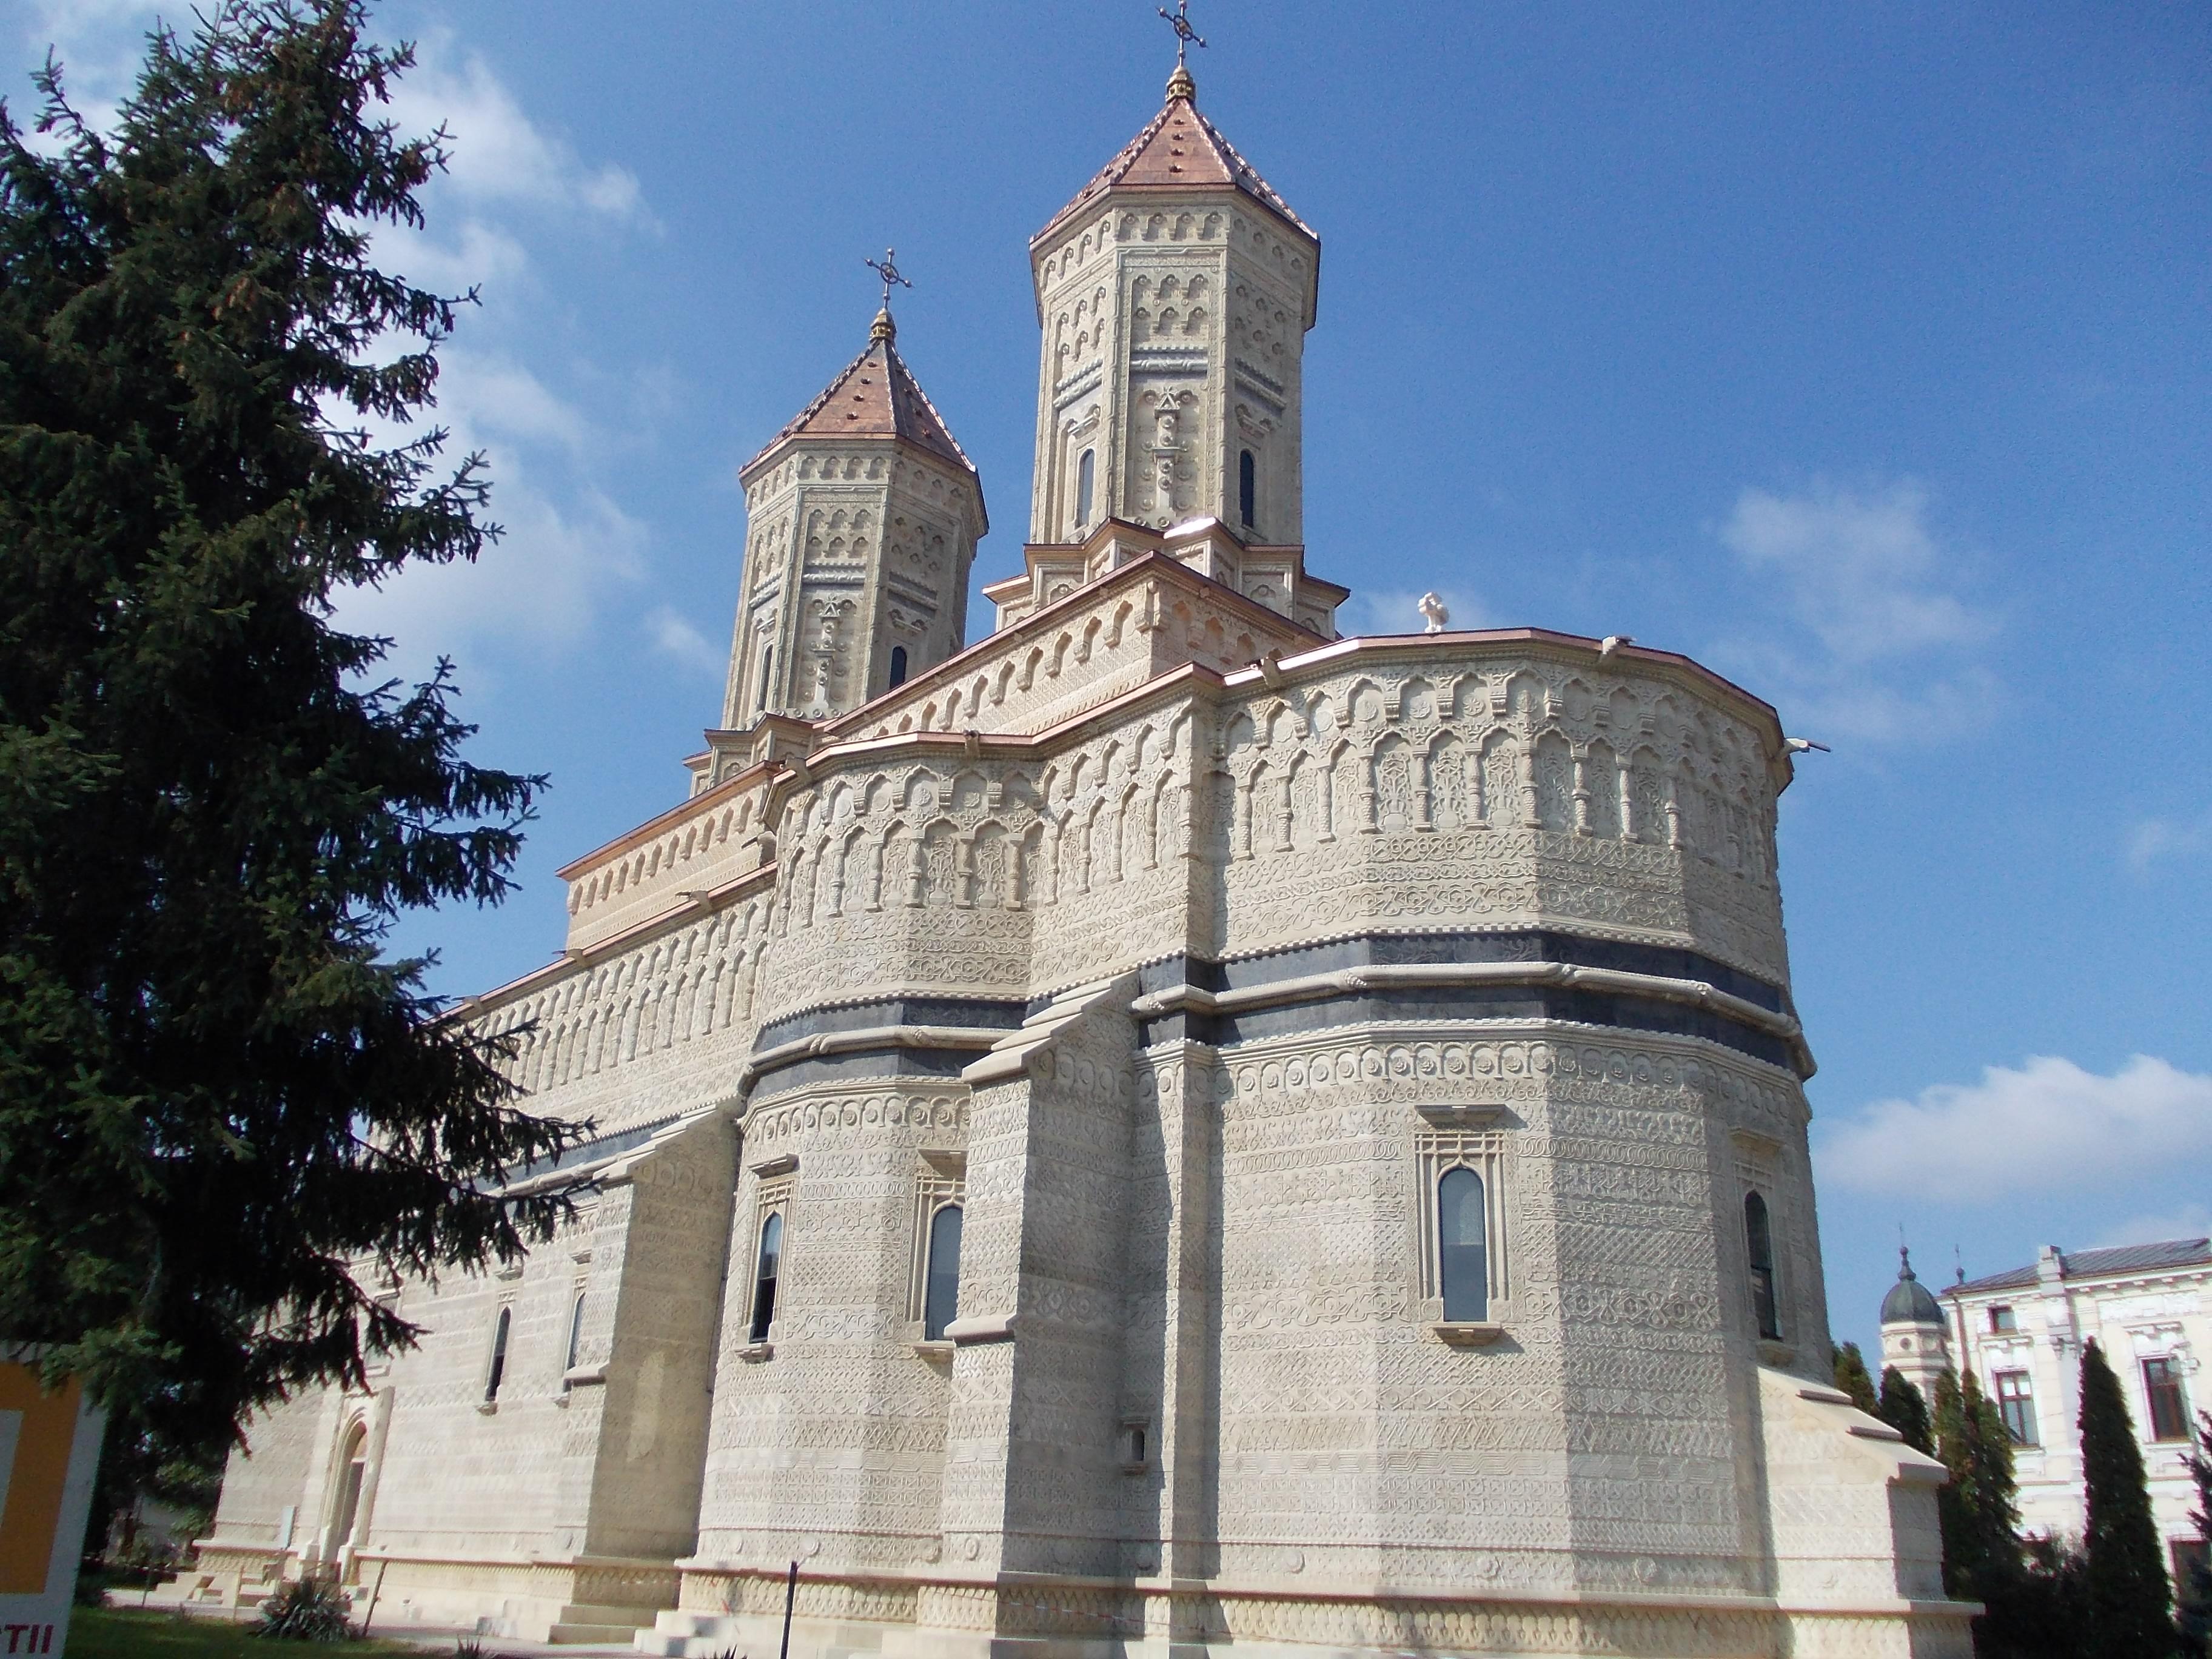 Manastirea Trei Ierarhi din Iasi / Three Hierarchs Monastery Iasi, Romania